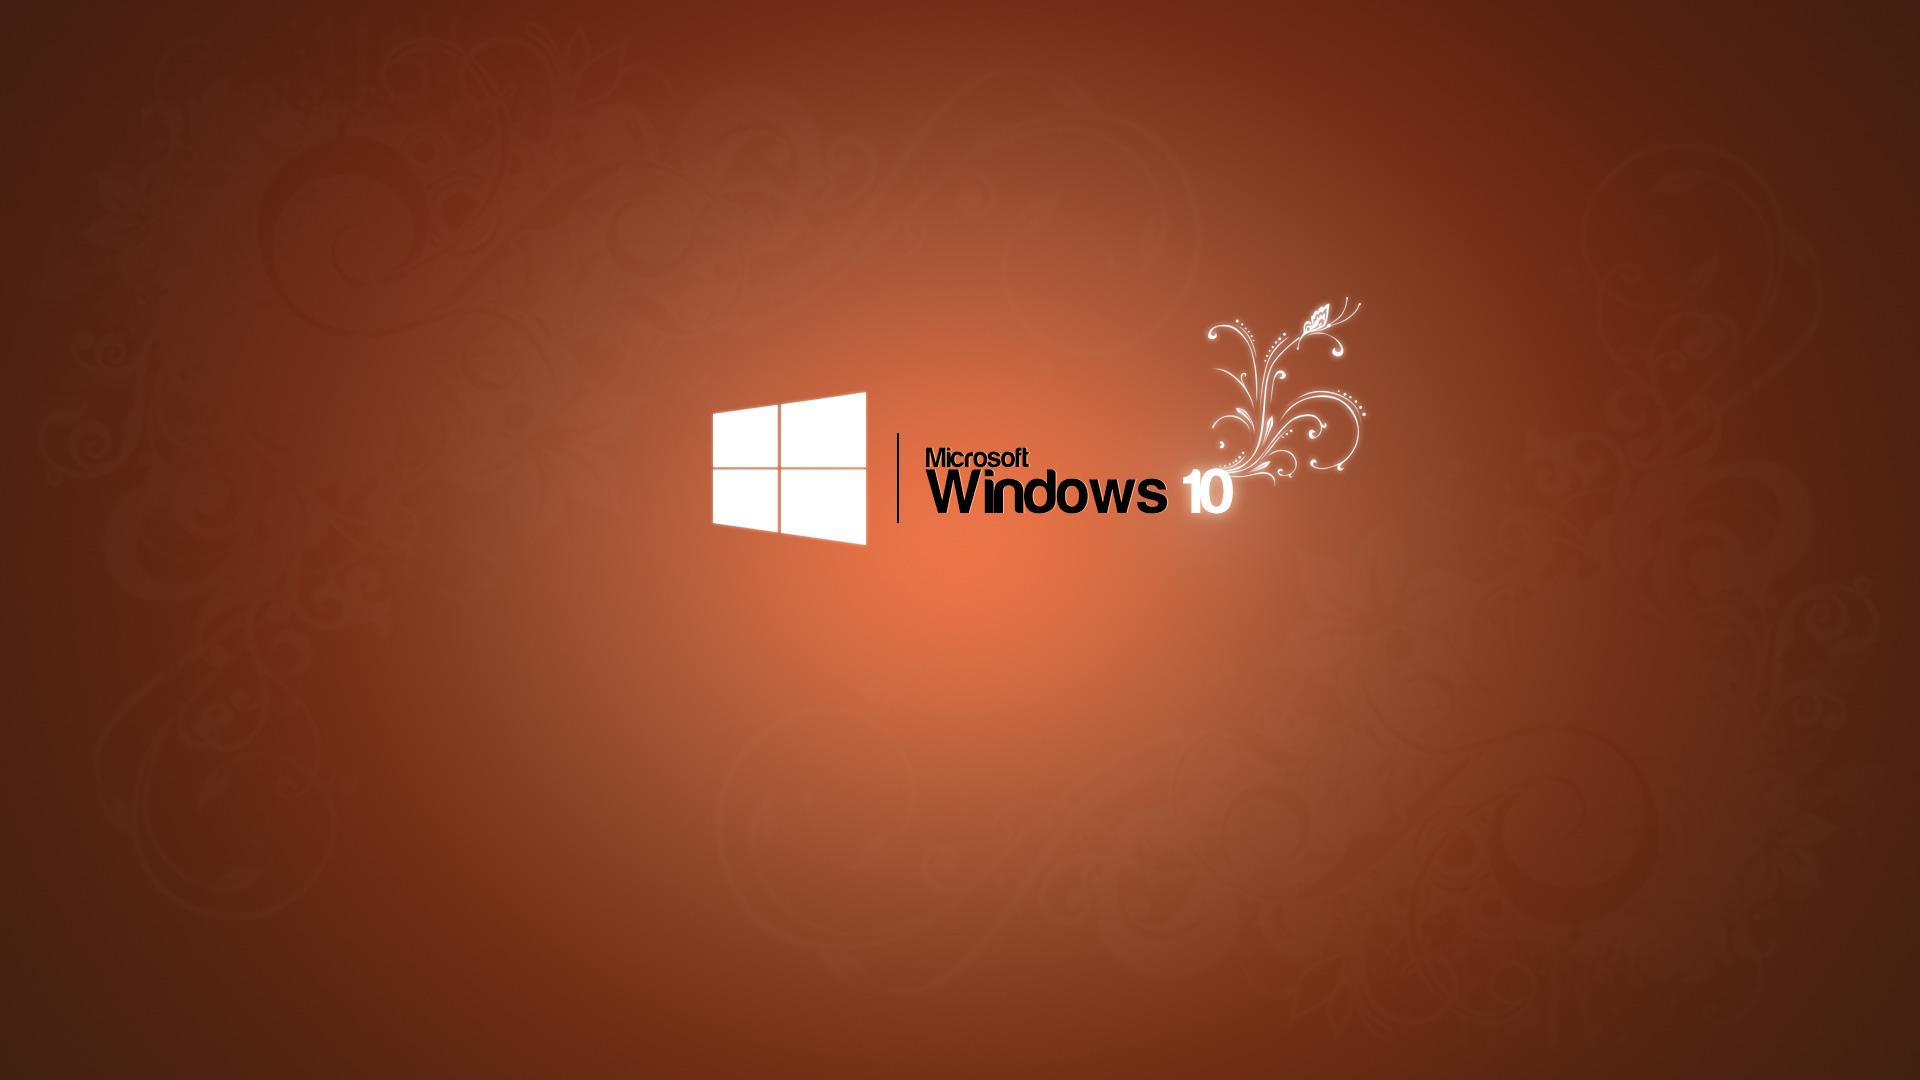 Wallpapers   Windows 10 1920x1080 wallpaper 1920x1080